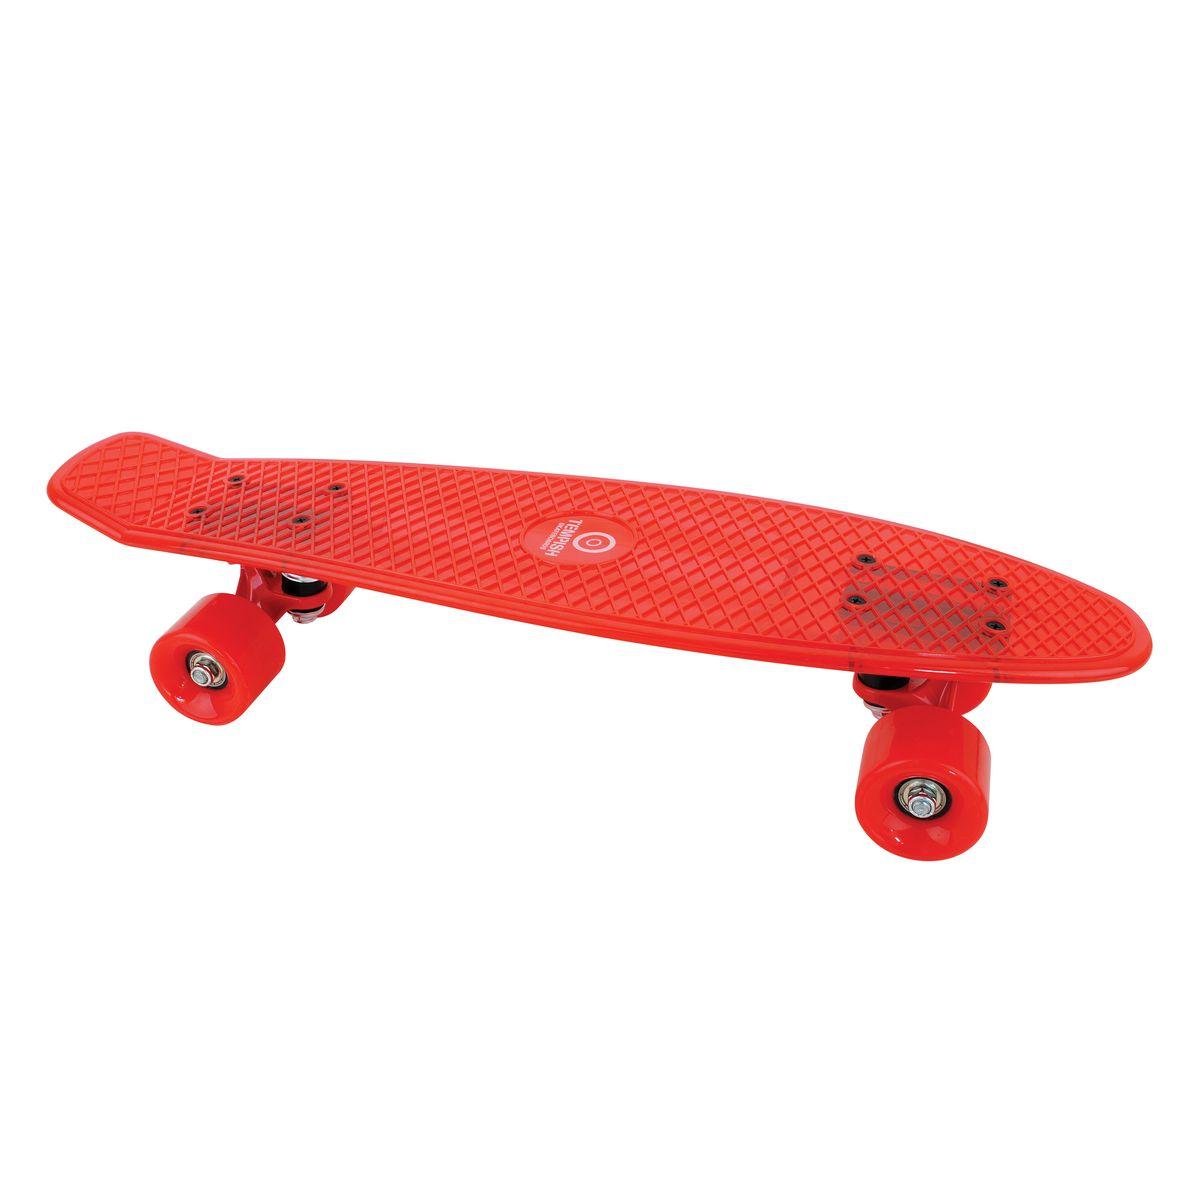 Скейтборд пластиковый Tempish Buffy Star, цвет: красныйRUC-01Пени борд Tempish Buffy нагрузка до 100 кг